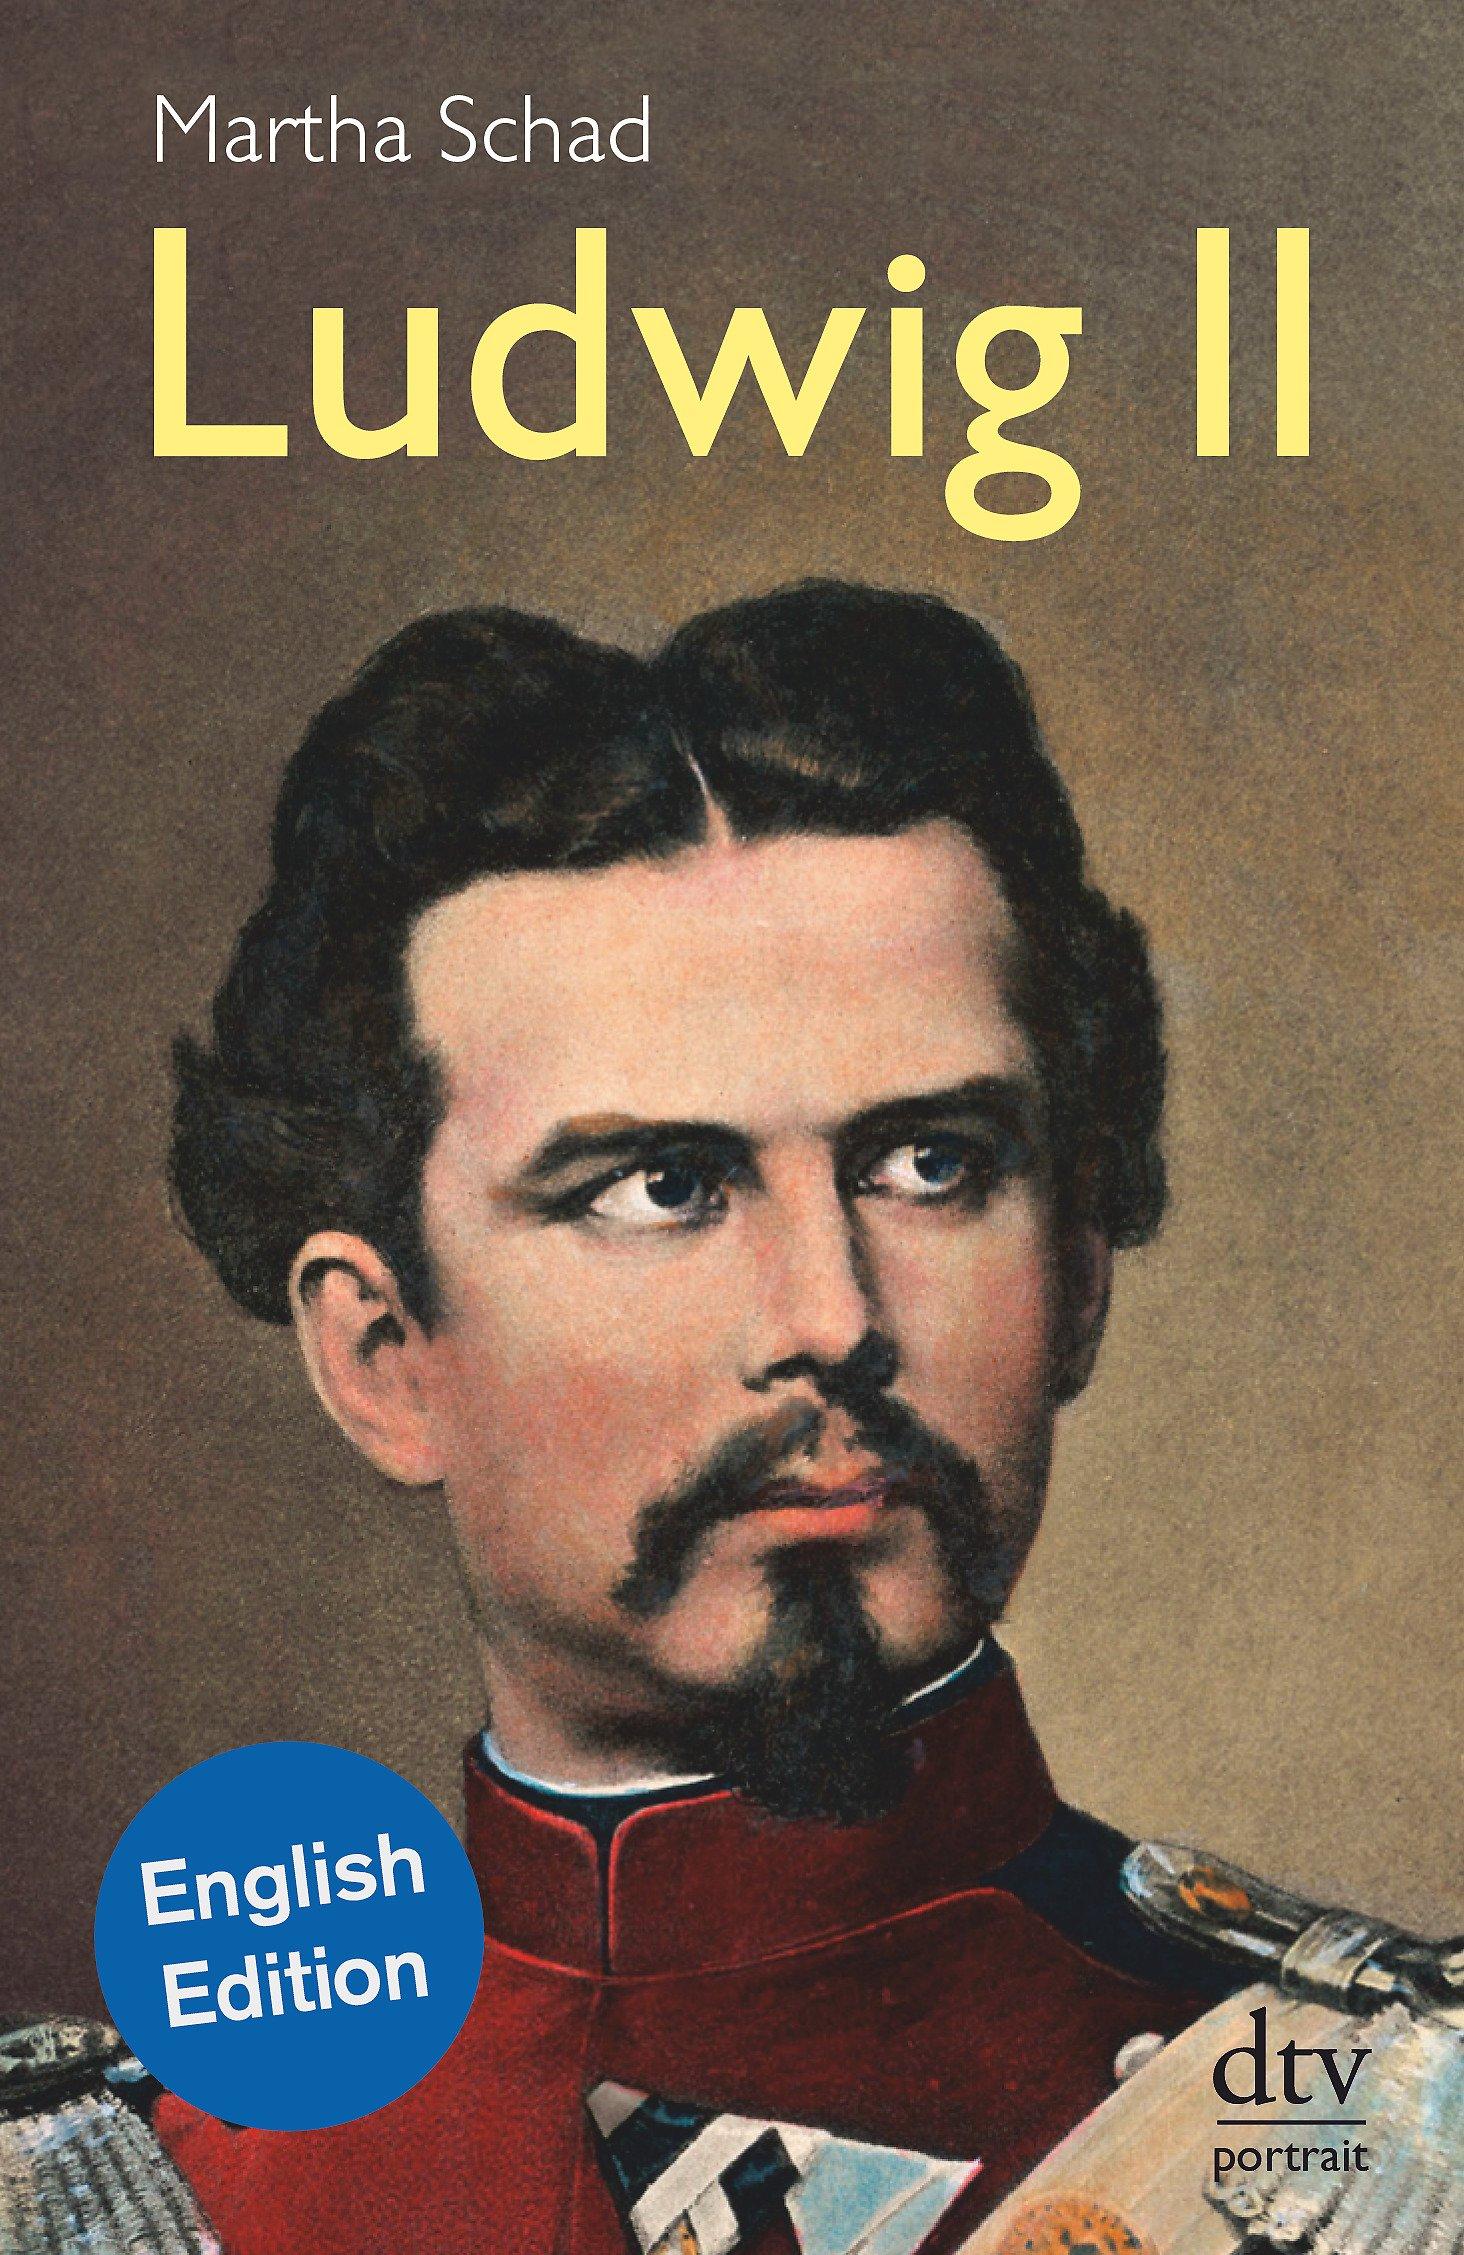 Ludwig II, English Edition ebook